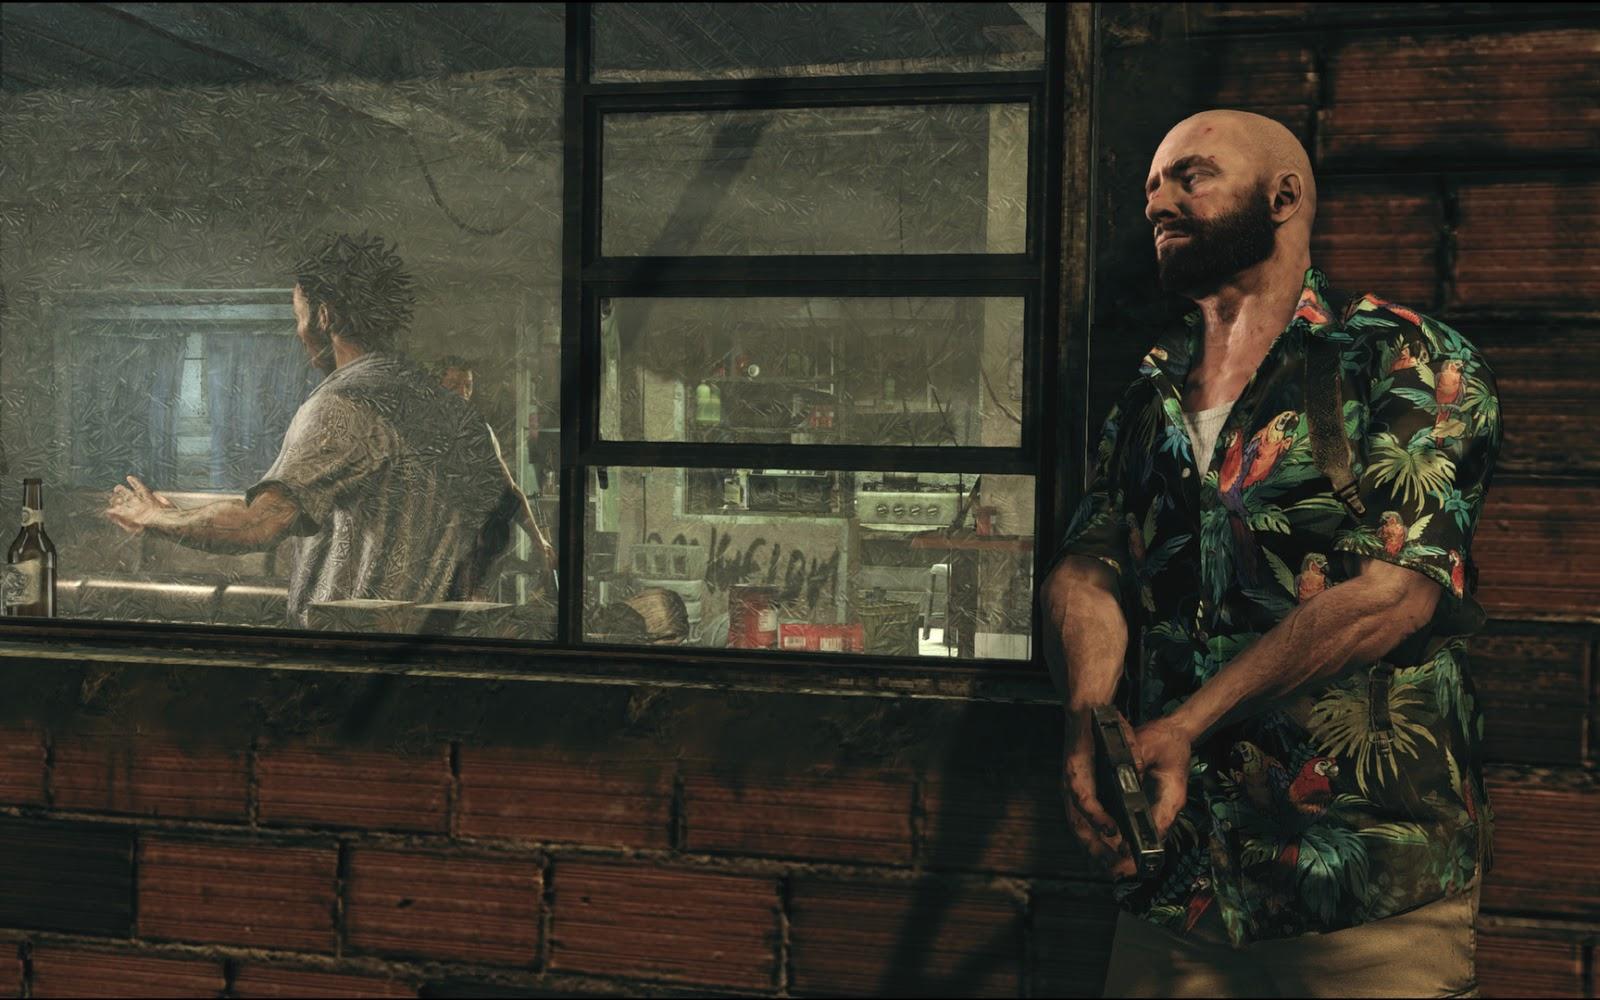 Max Payne 3 Complete Edition ESPAÑOL PC Descargar Full (RELOADED) + REPACK 5 DVD5 (JPW) 3